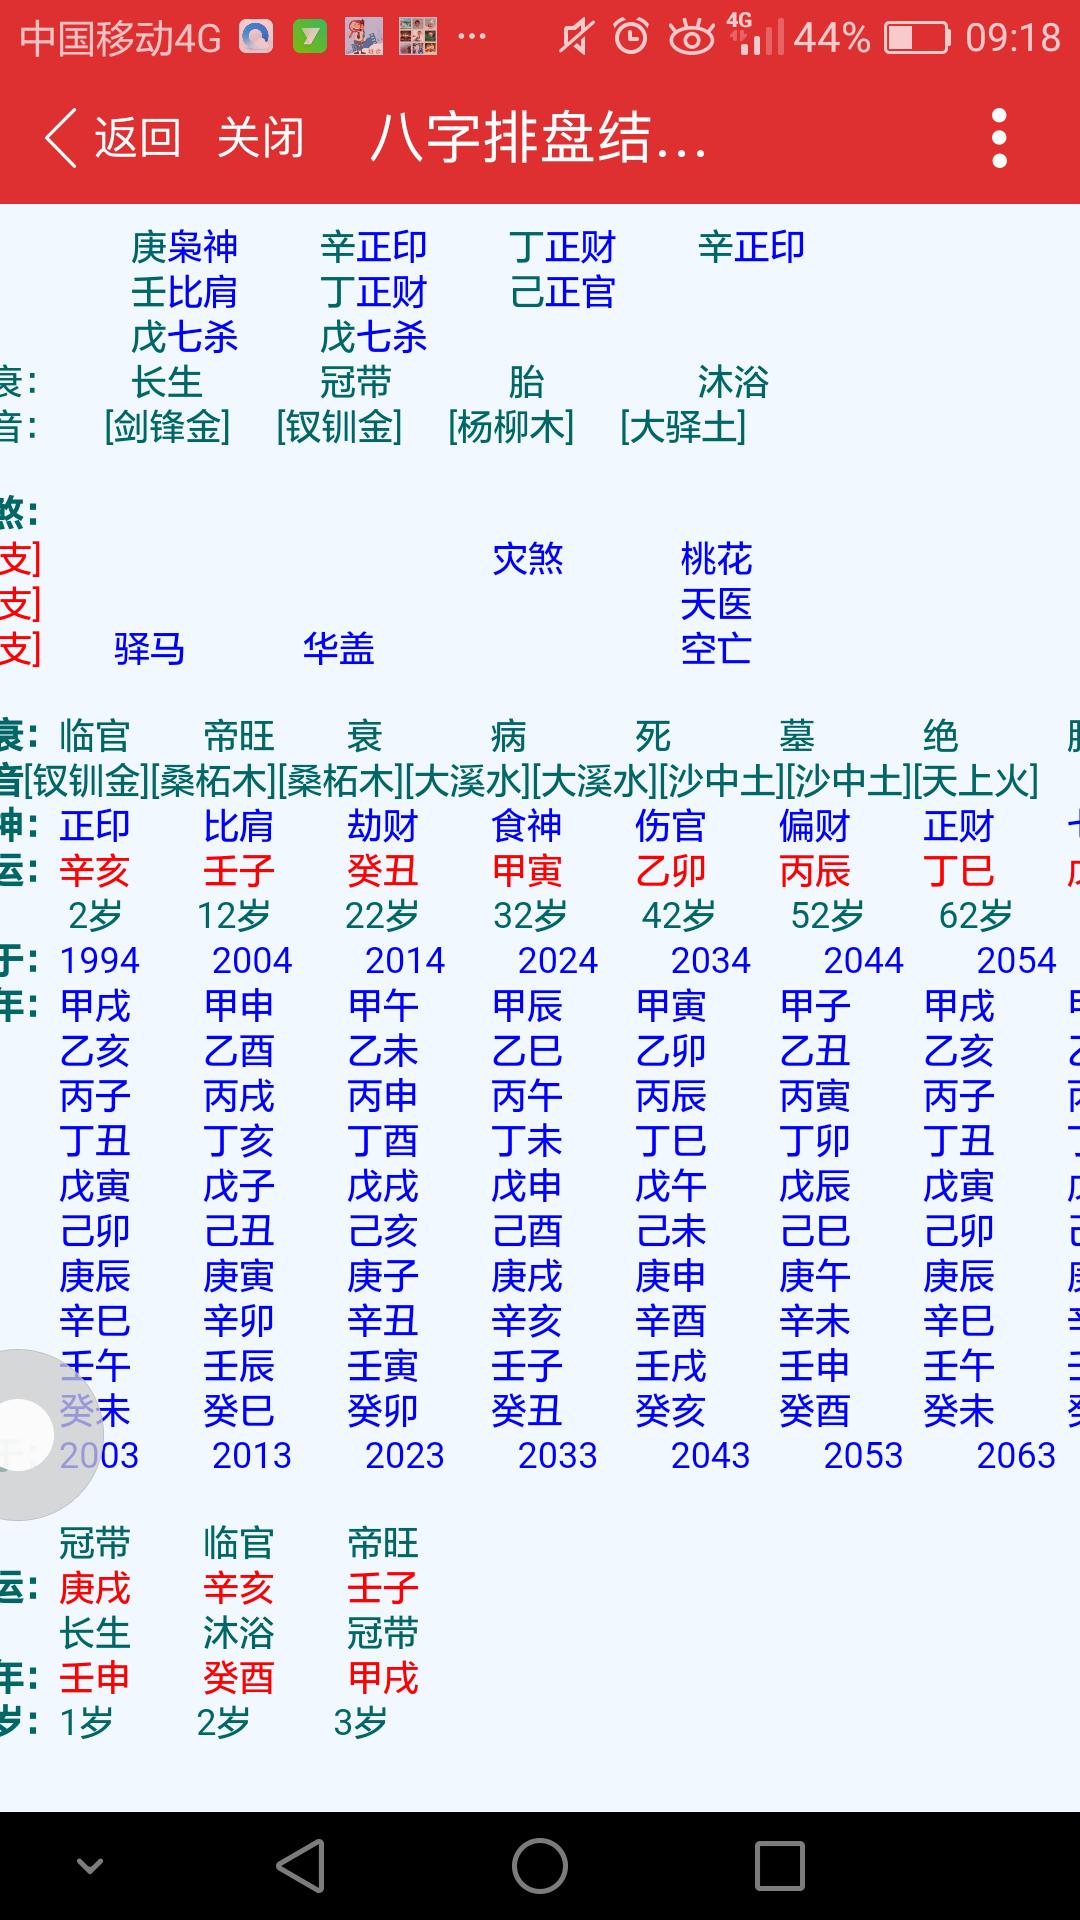 Screenshot_2019-03-12-09-18-55.png